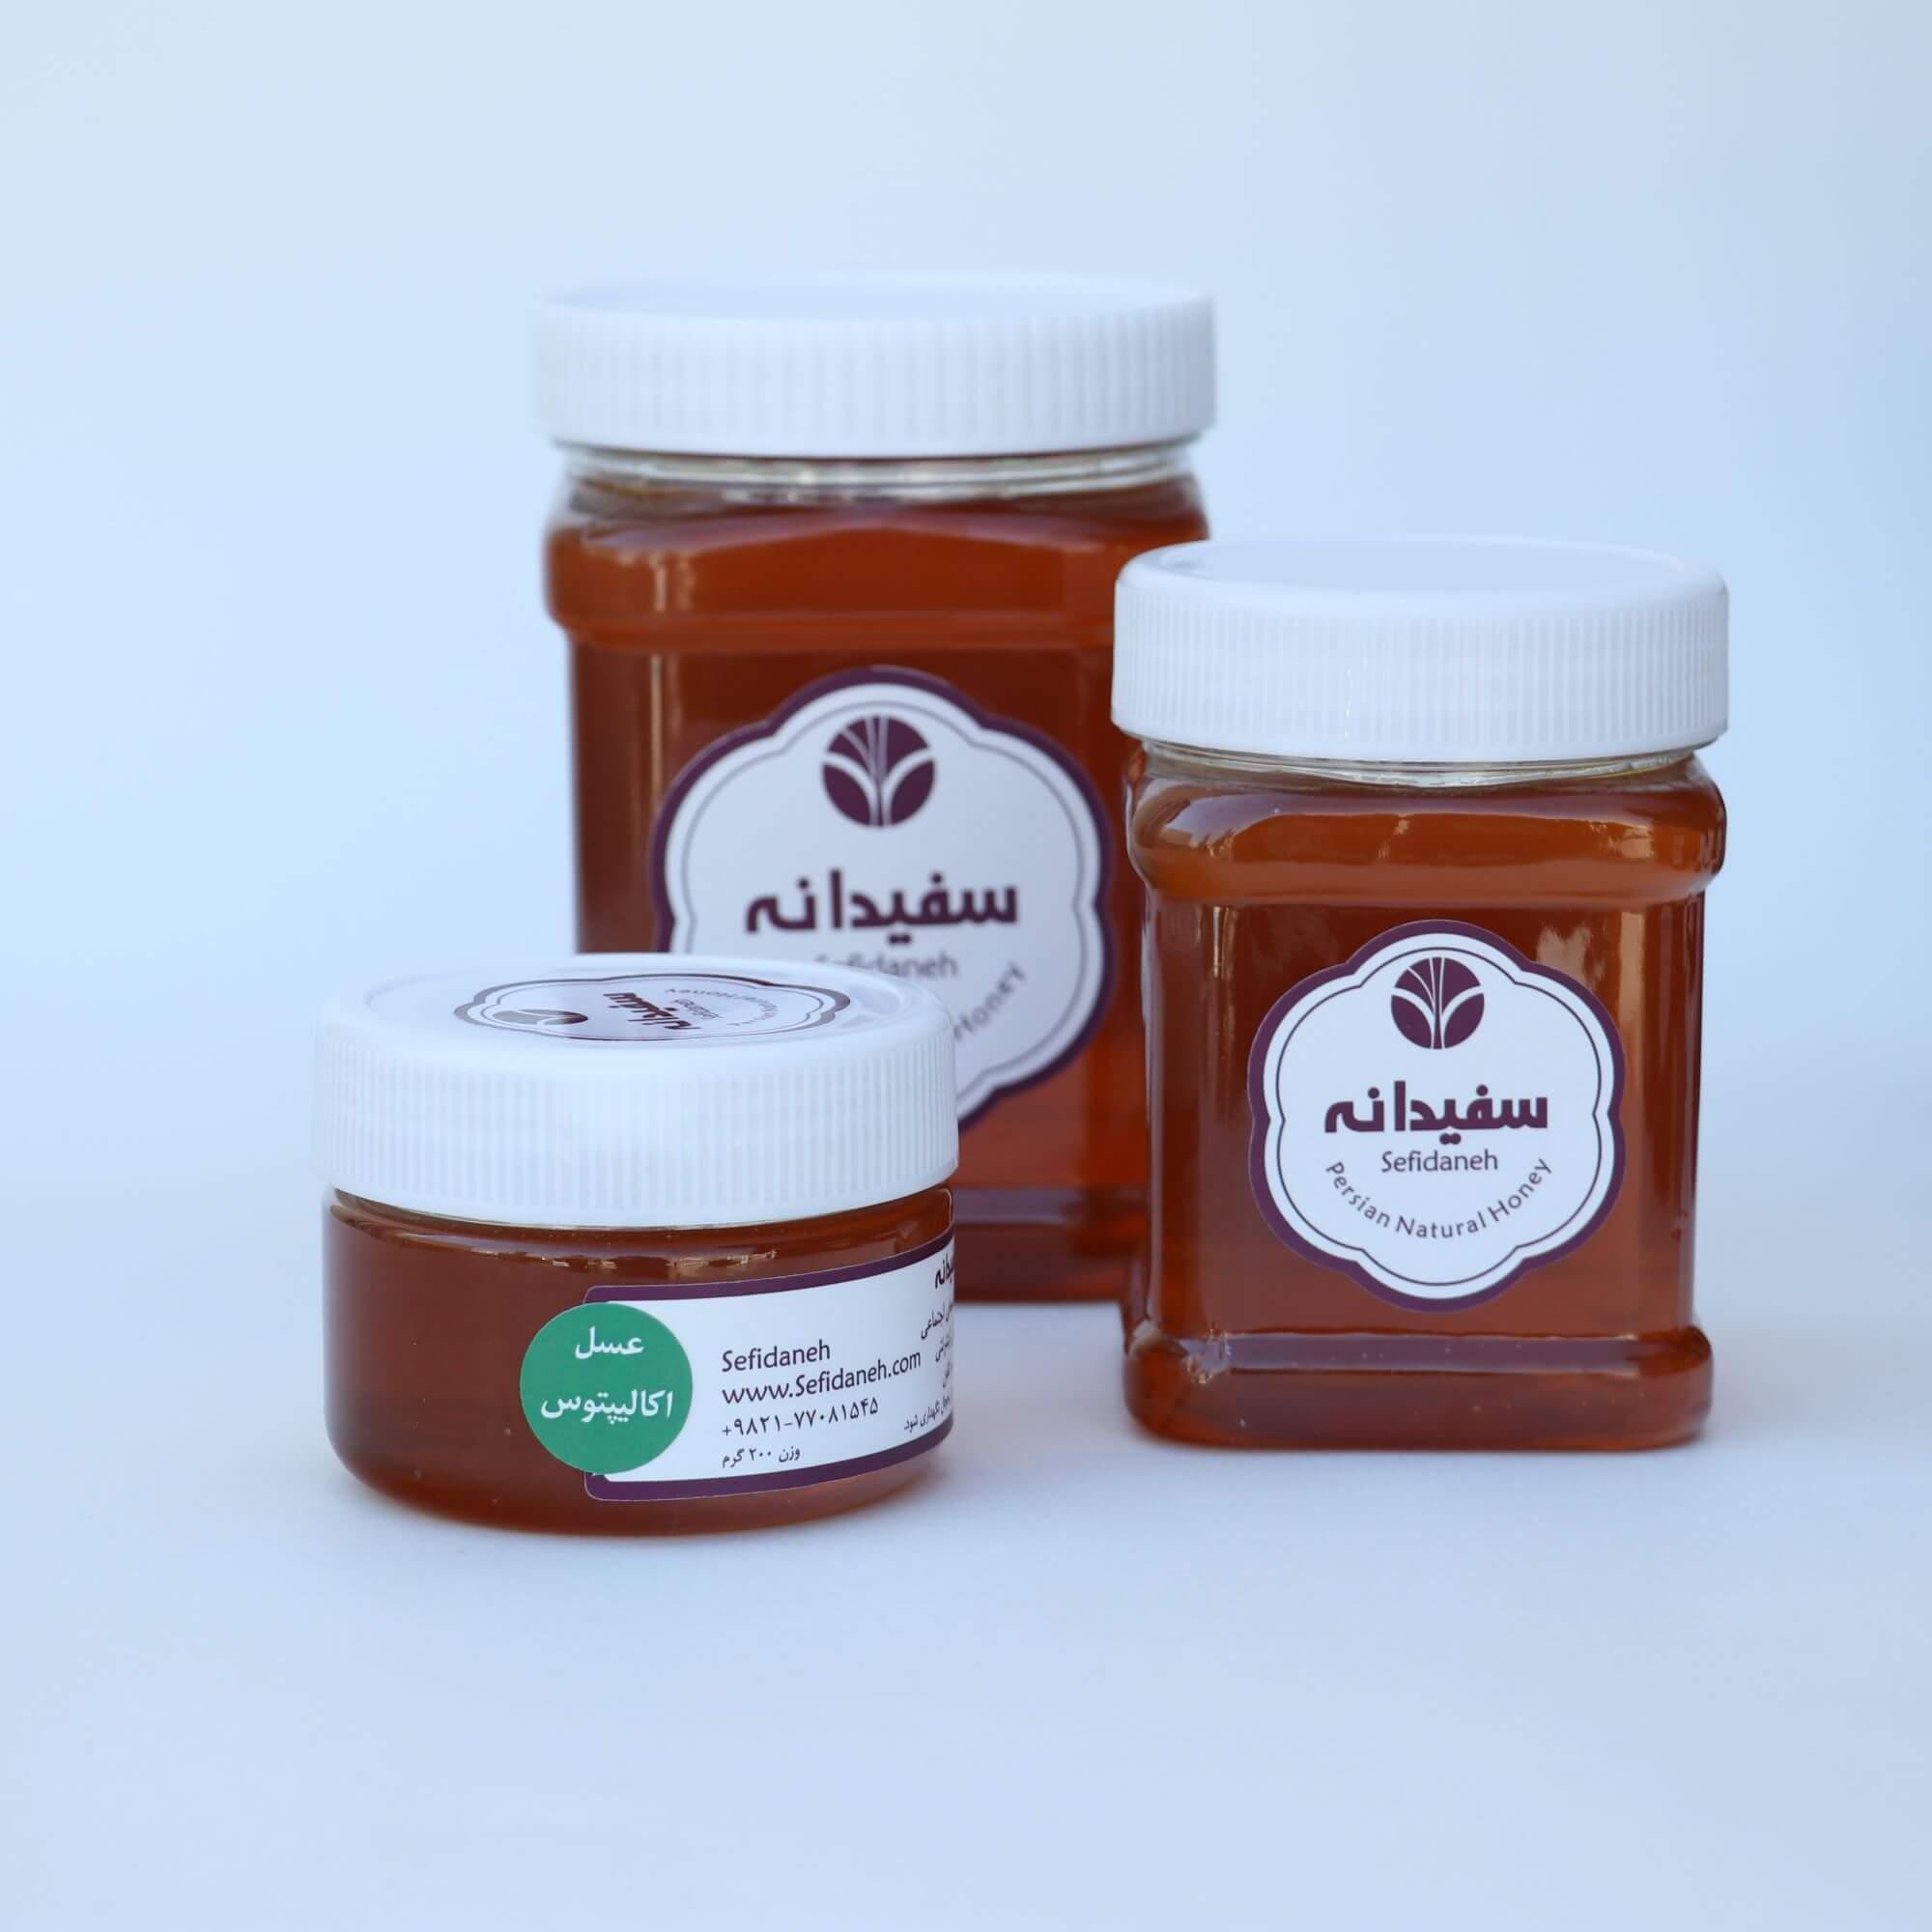 خرید عسل اکالیپتوس | قیمت عسل اکالیپتوس | خواص عسل اکالیپتوس | طبع عسل اکالیپتوس | سفیدانه